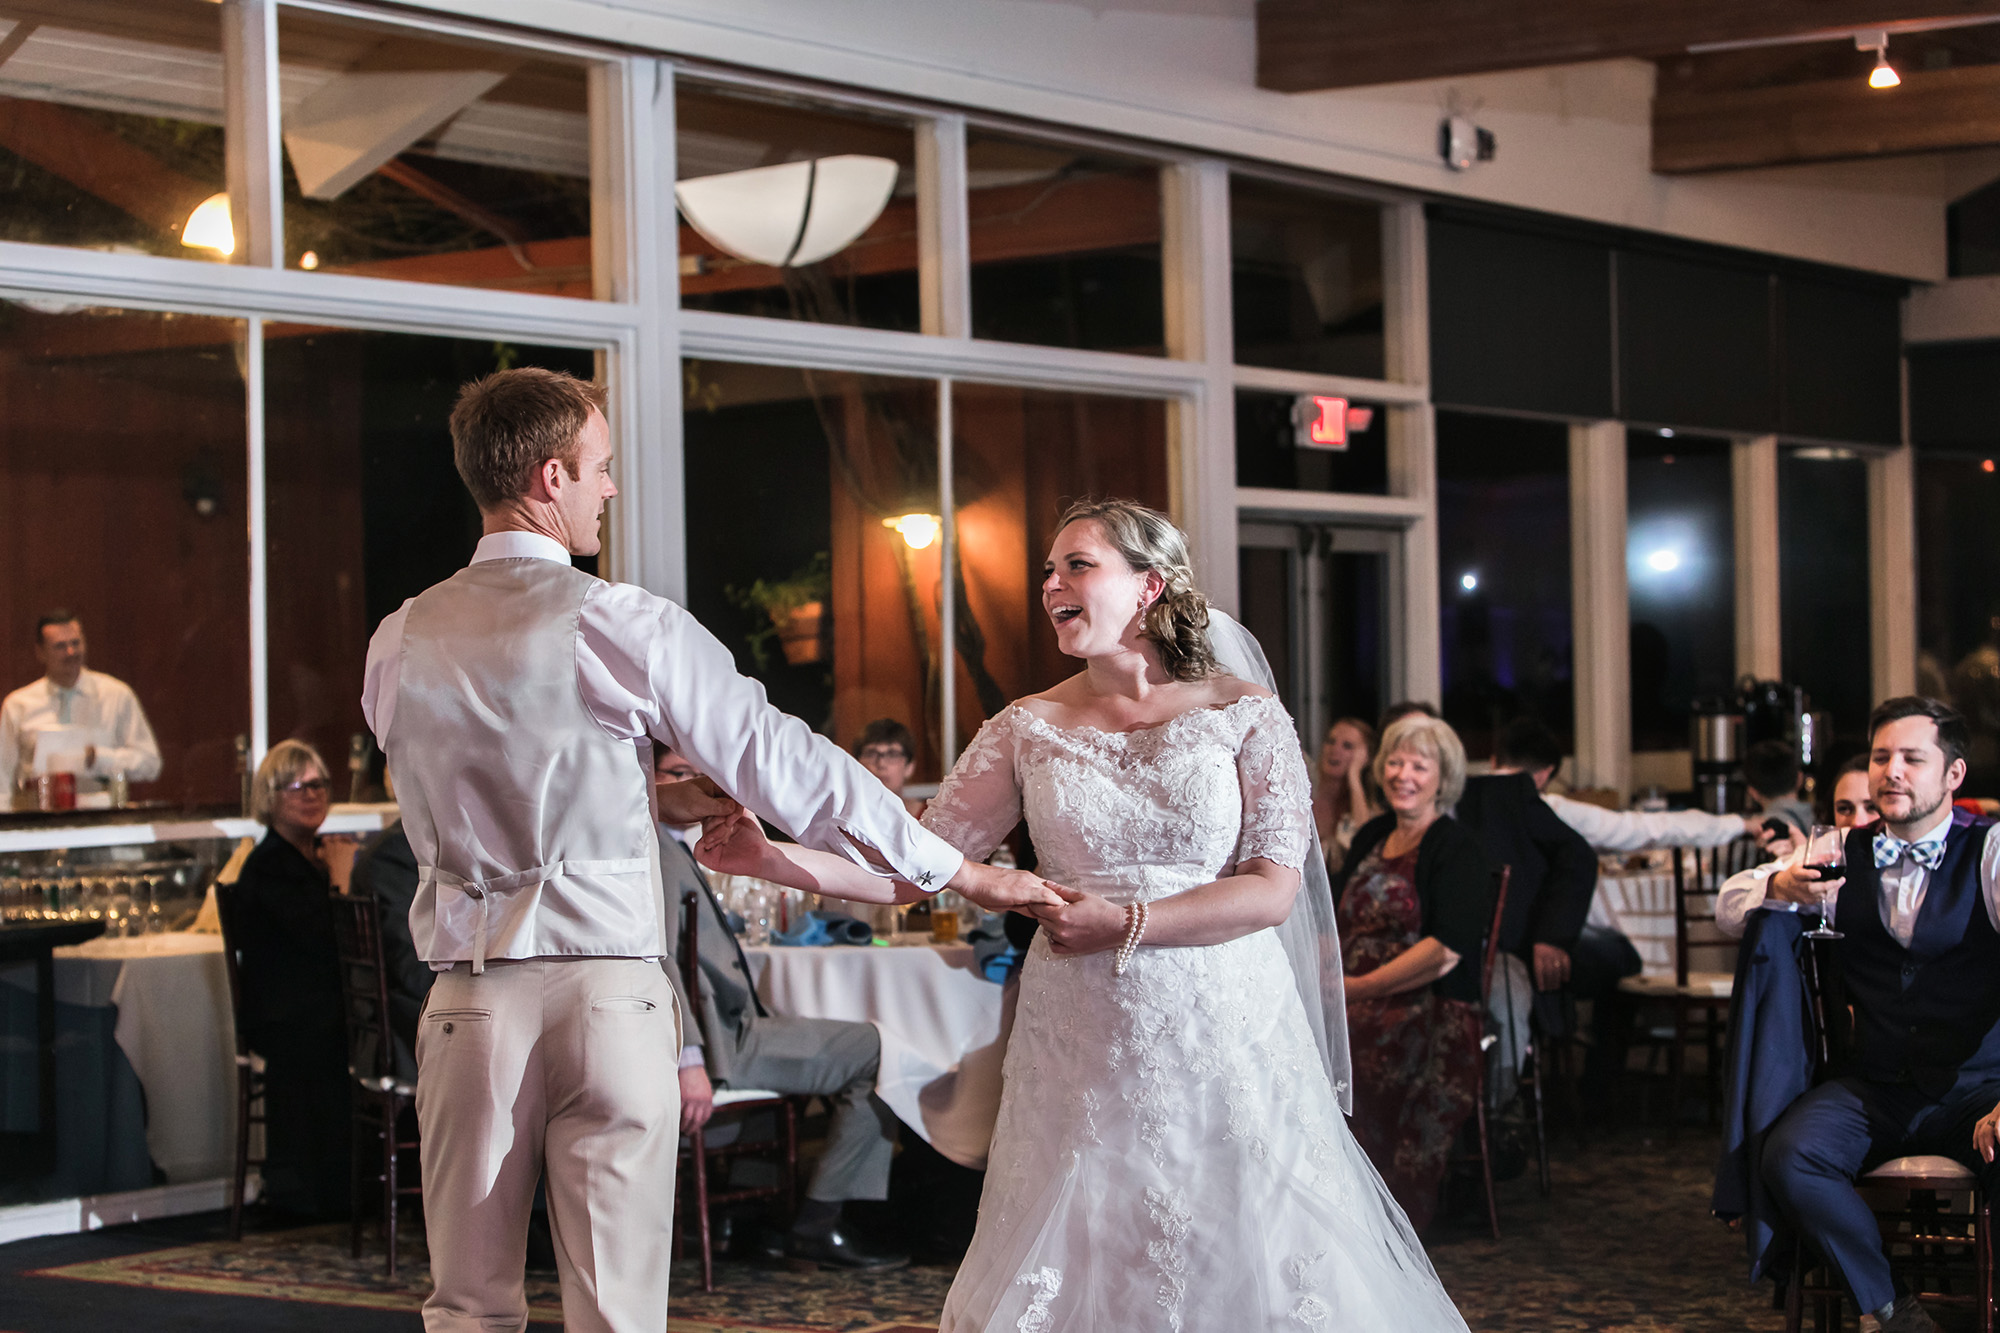 unforgettable-st-monica-wedding-carrie-vines-photography-123.jpg